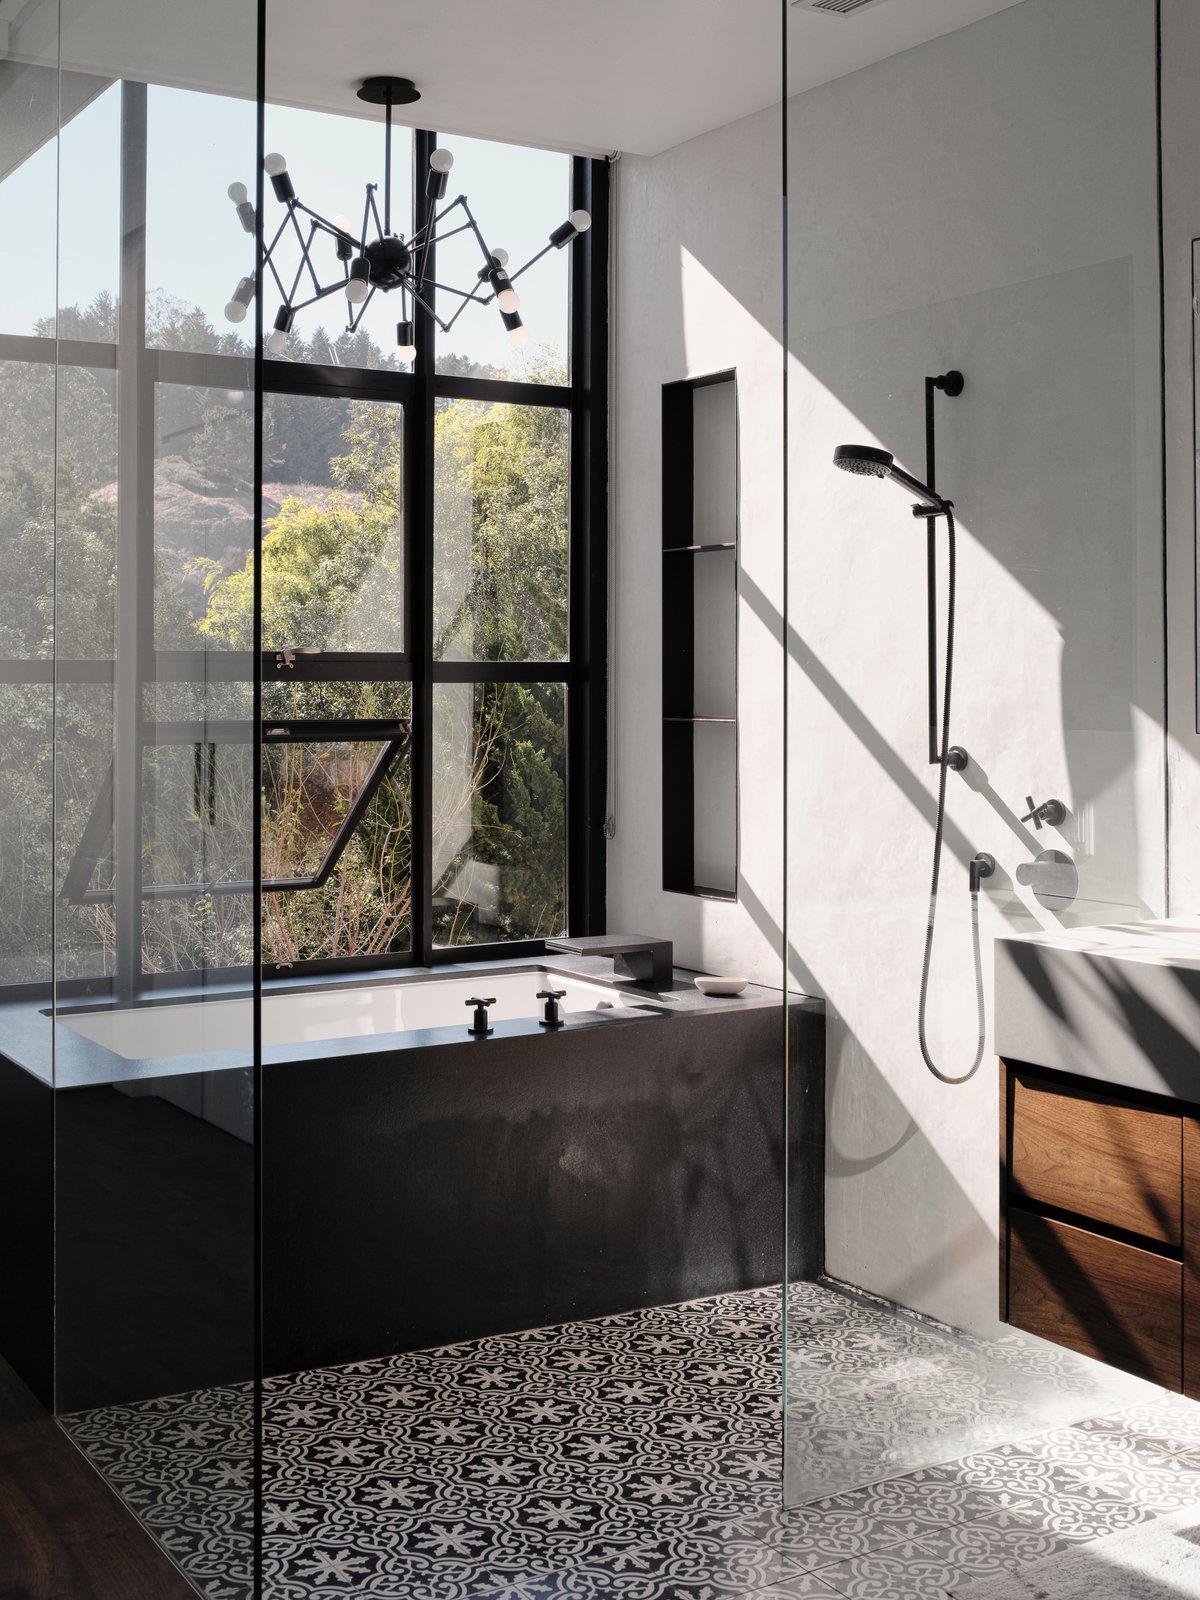 Levy Art + Architecture  Síol Studios Valley Street Project master bathroom